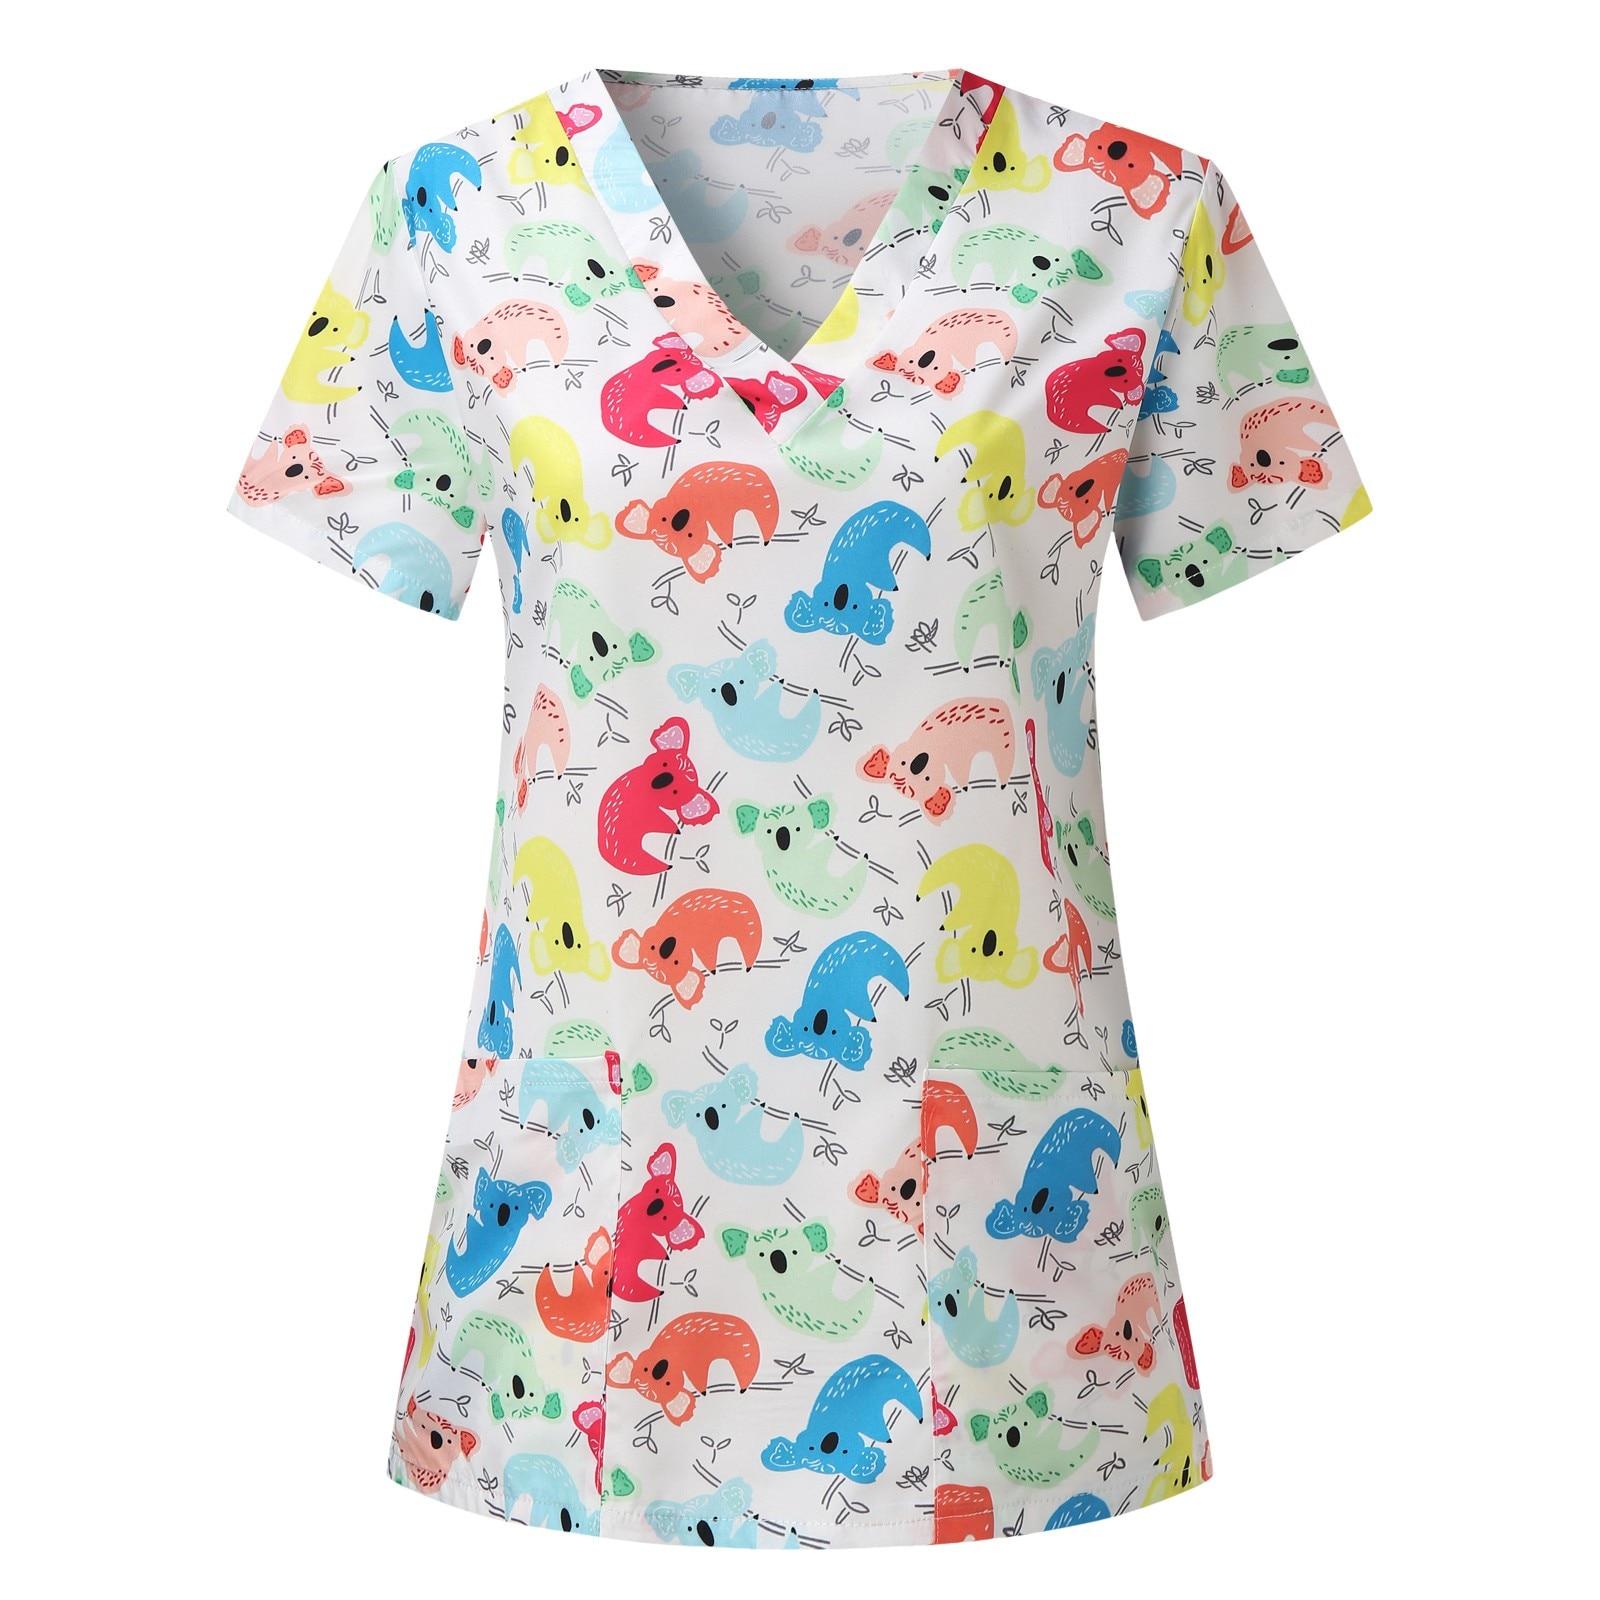 Nurse Uniform Workwear Tops Pattern Printing V-neck Blouse Tops Scrubs Short Sleeve Women Breathable Pharmacy Nursing Uniform pharmacy